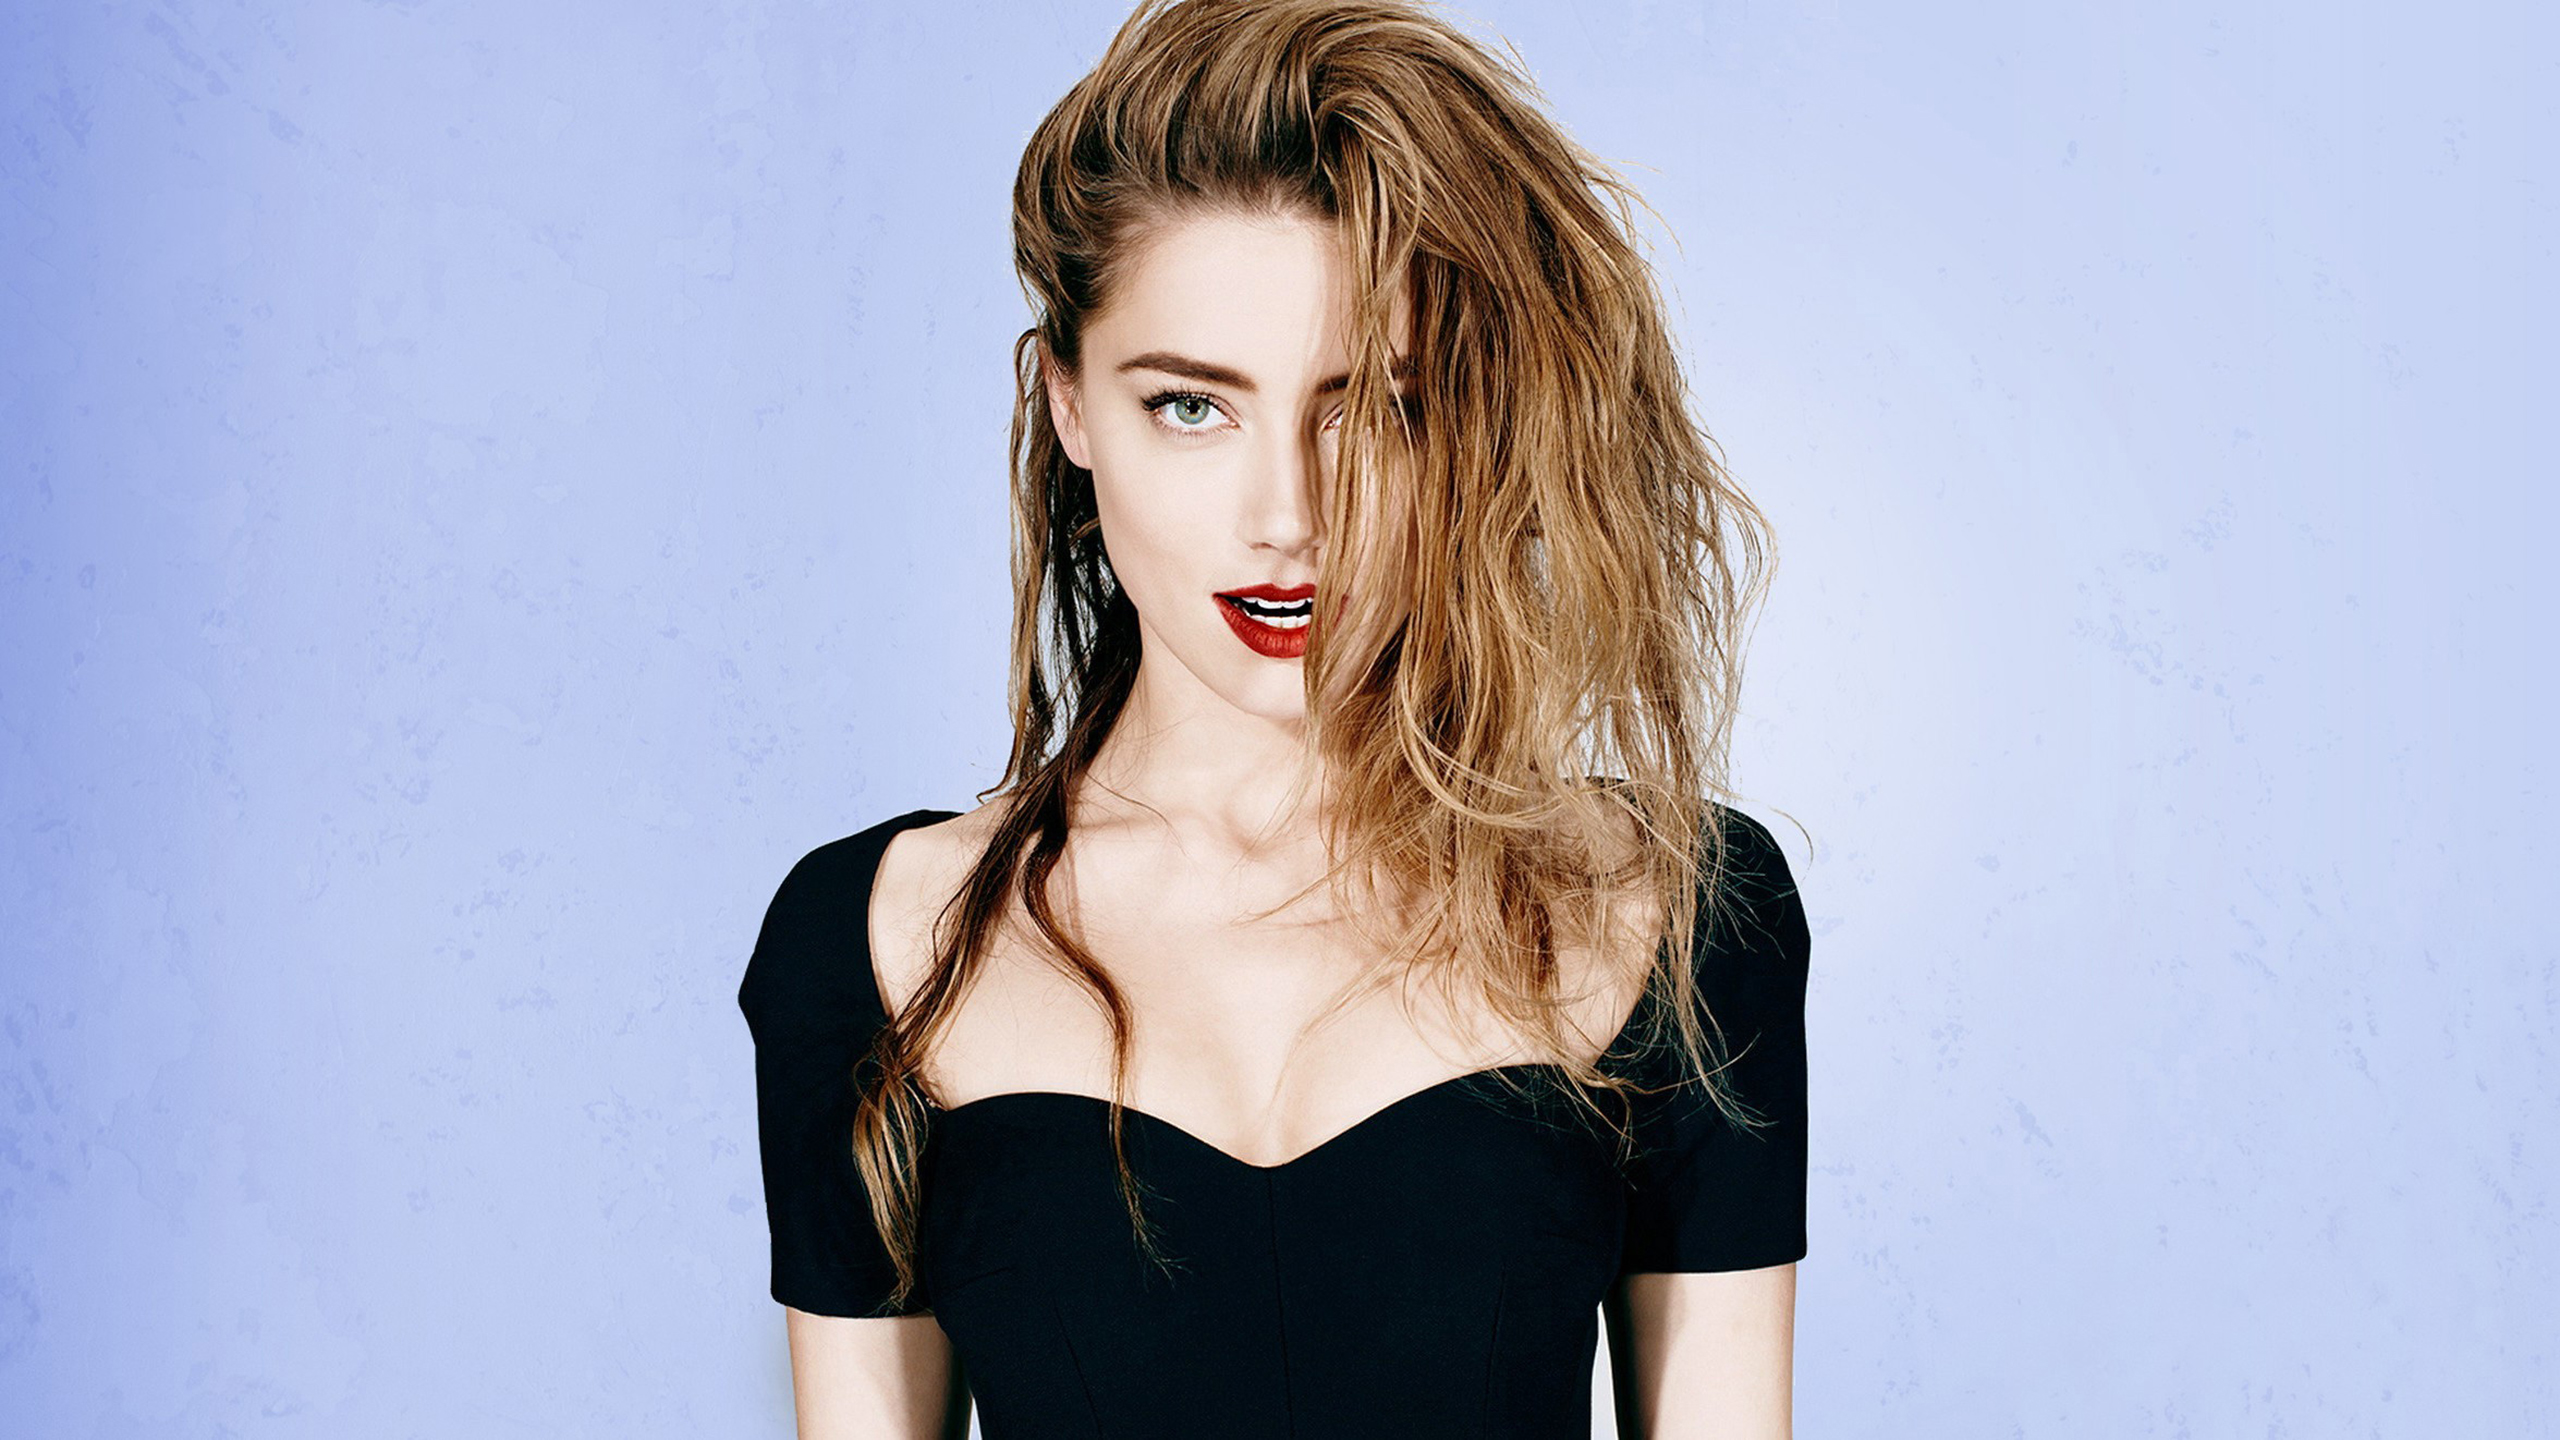 Amber Heard HD Wallpaper Background Image 2560x1440 ID 2560x1440